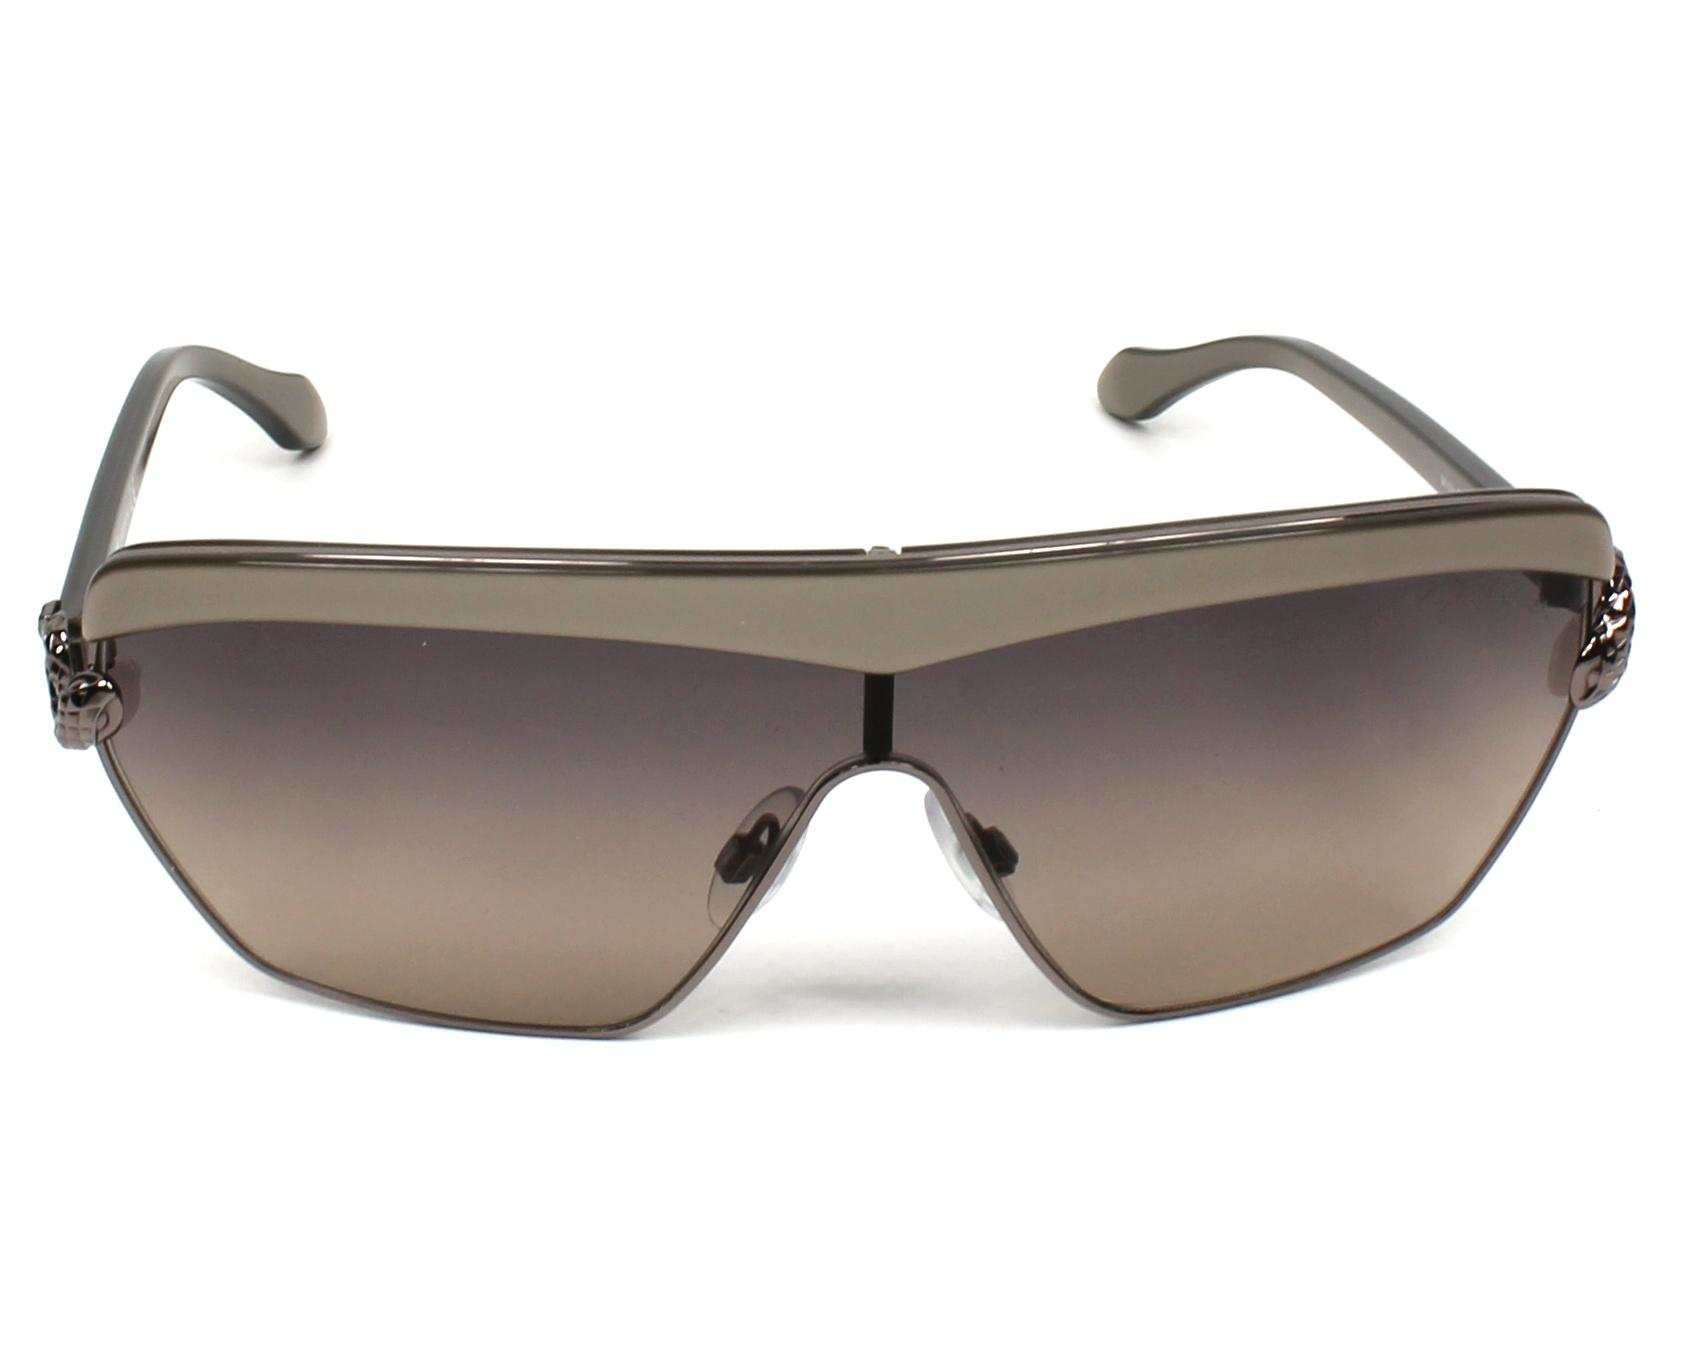 NEW Authentic Roberto Cavalli SunGlasses frames RC-749S 34B | eBay